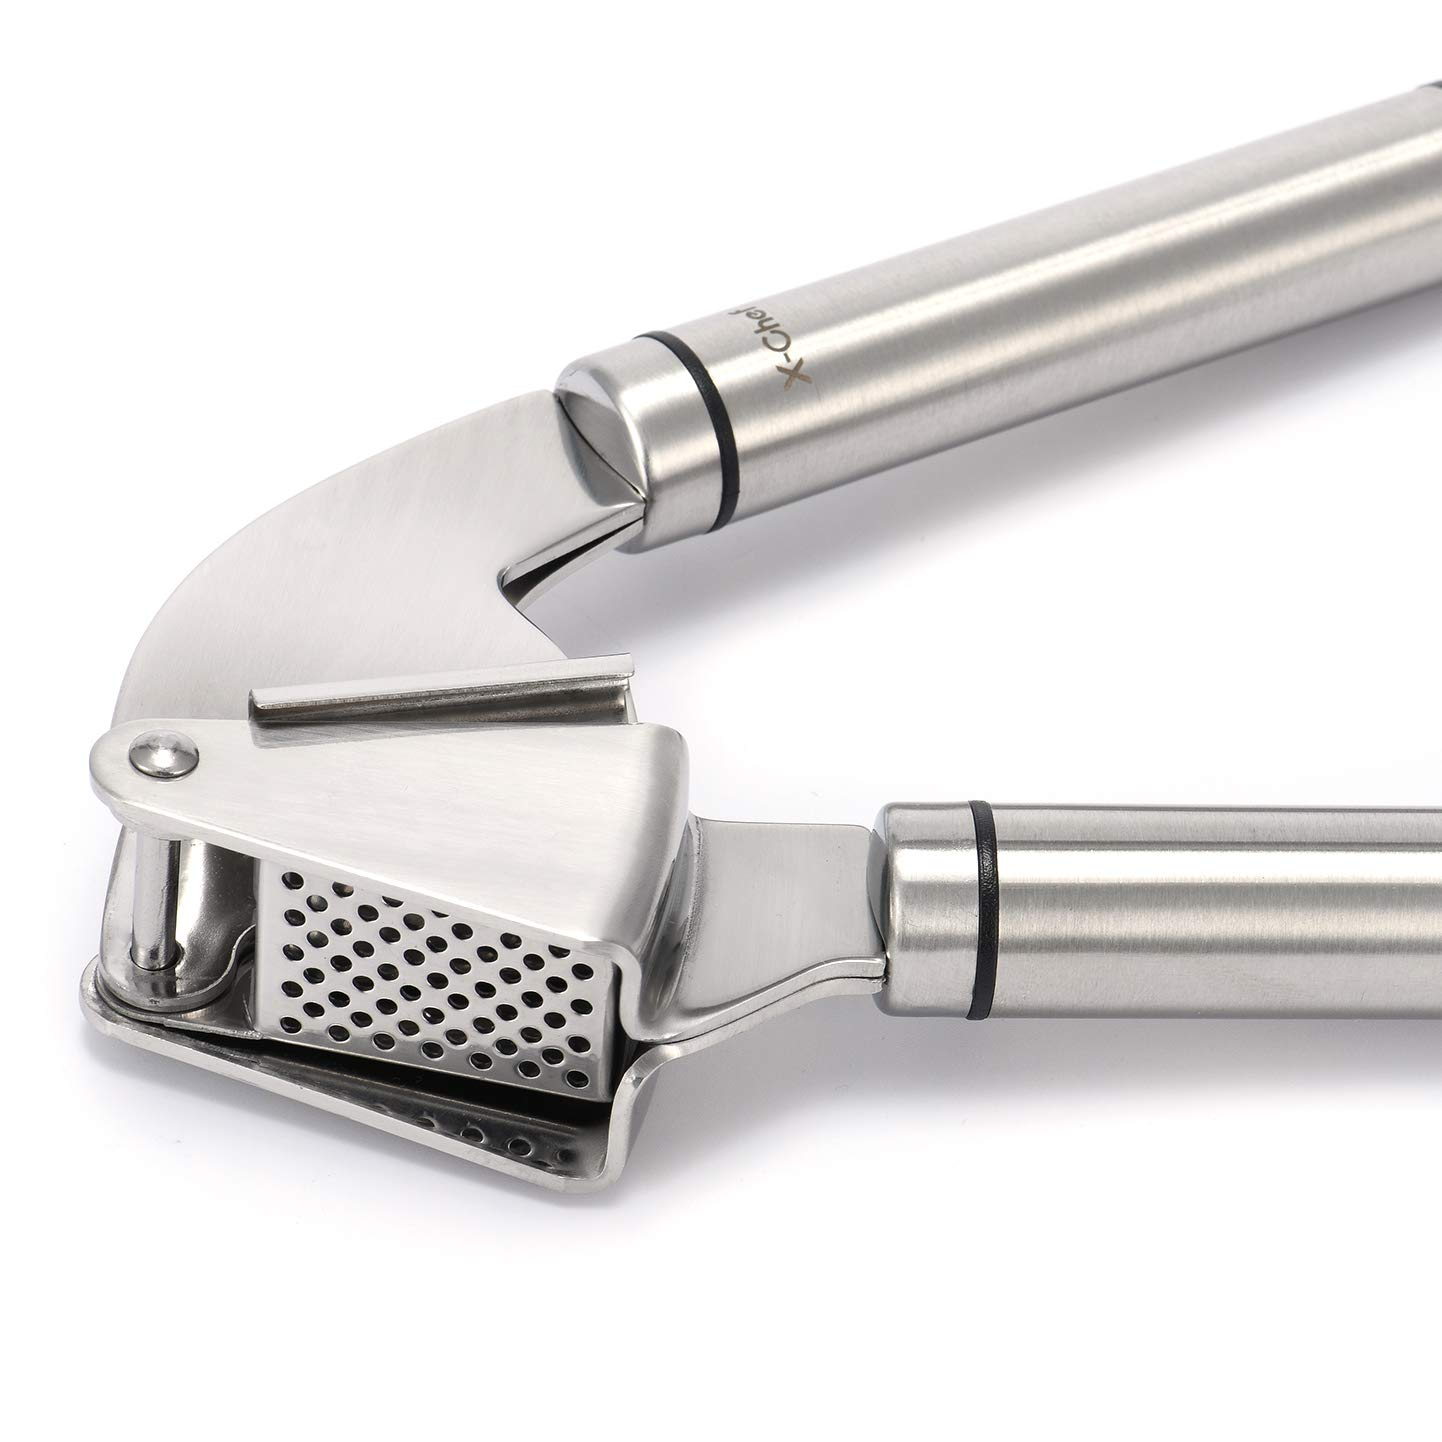 X-chef, steel garlic press